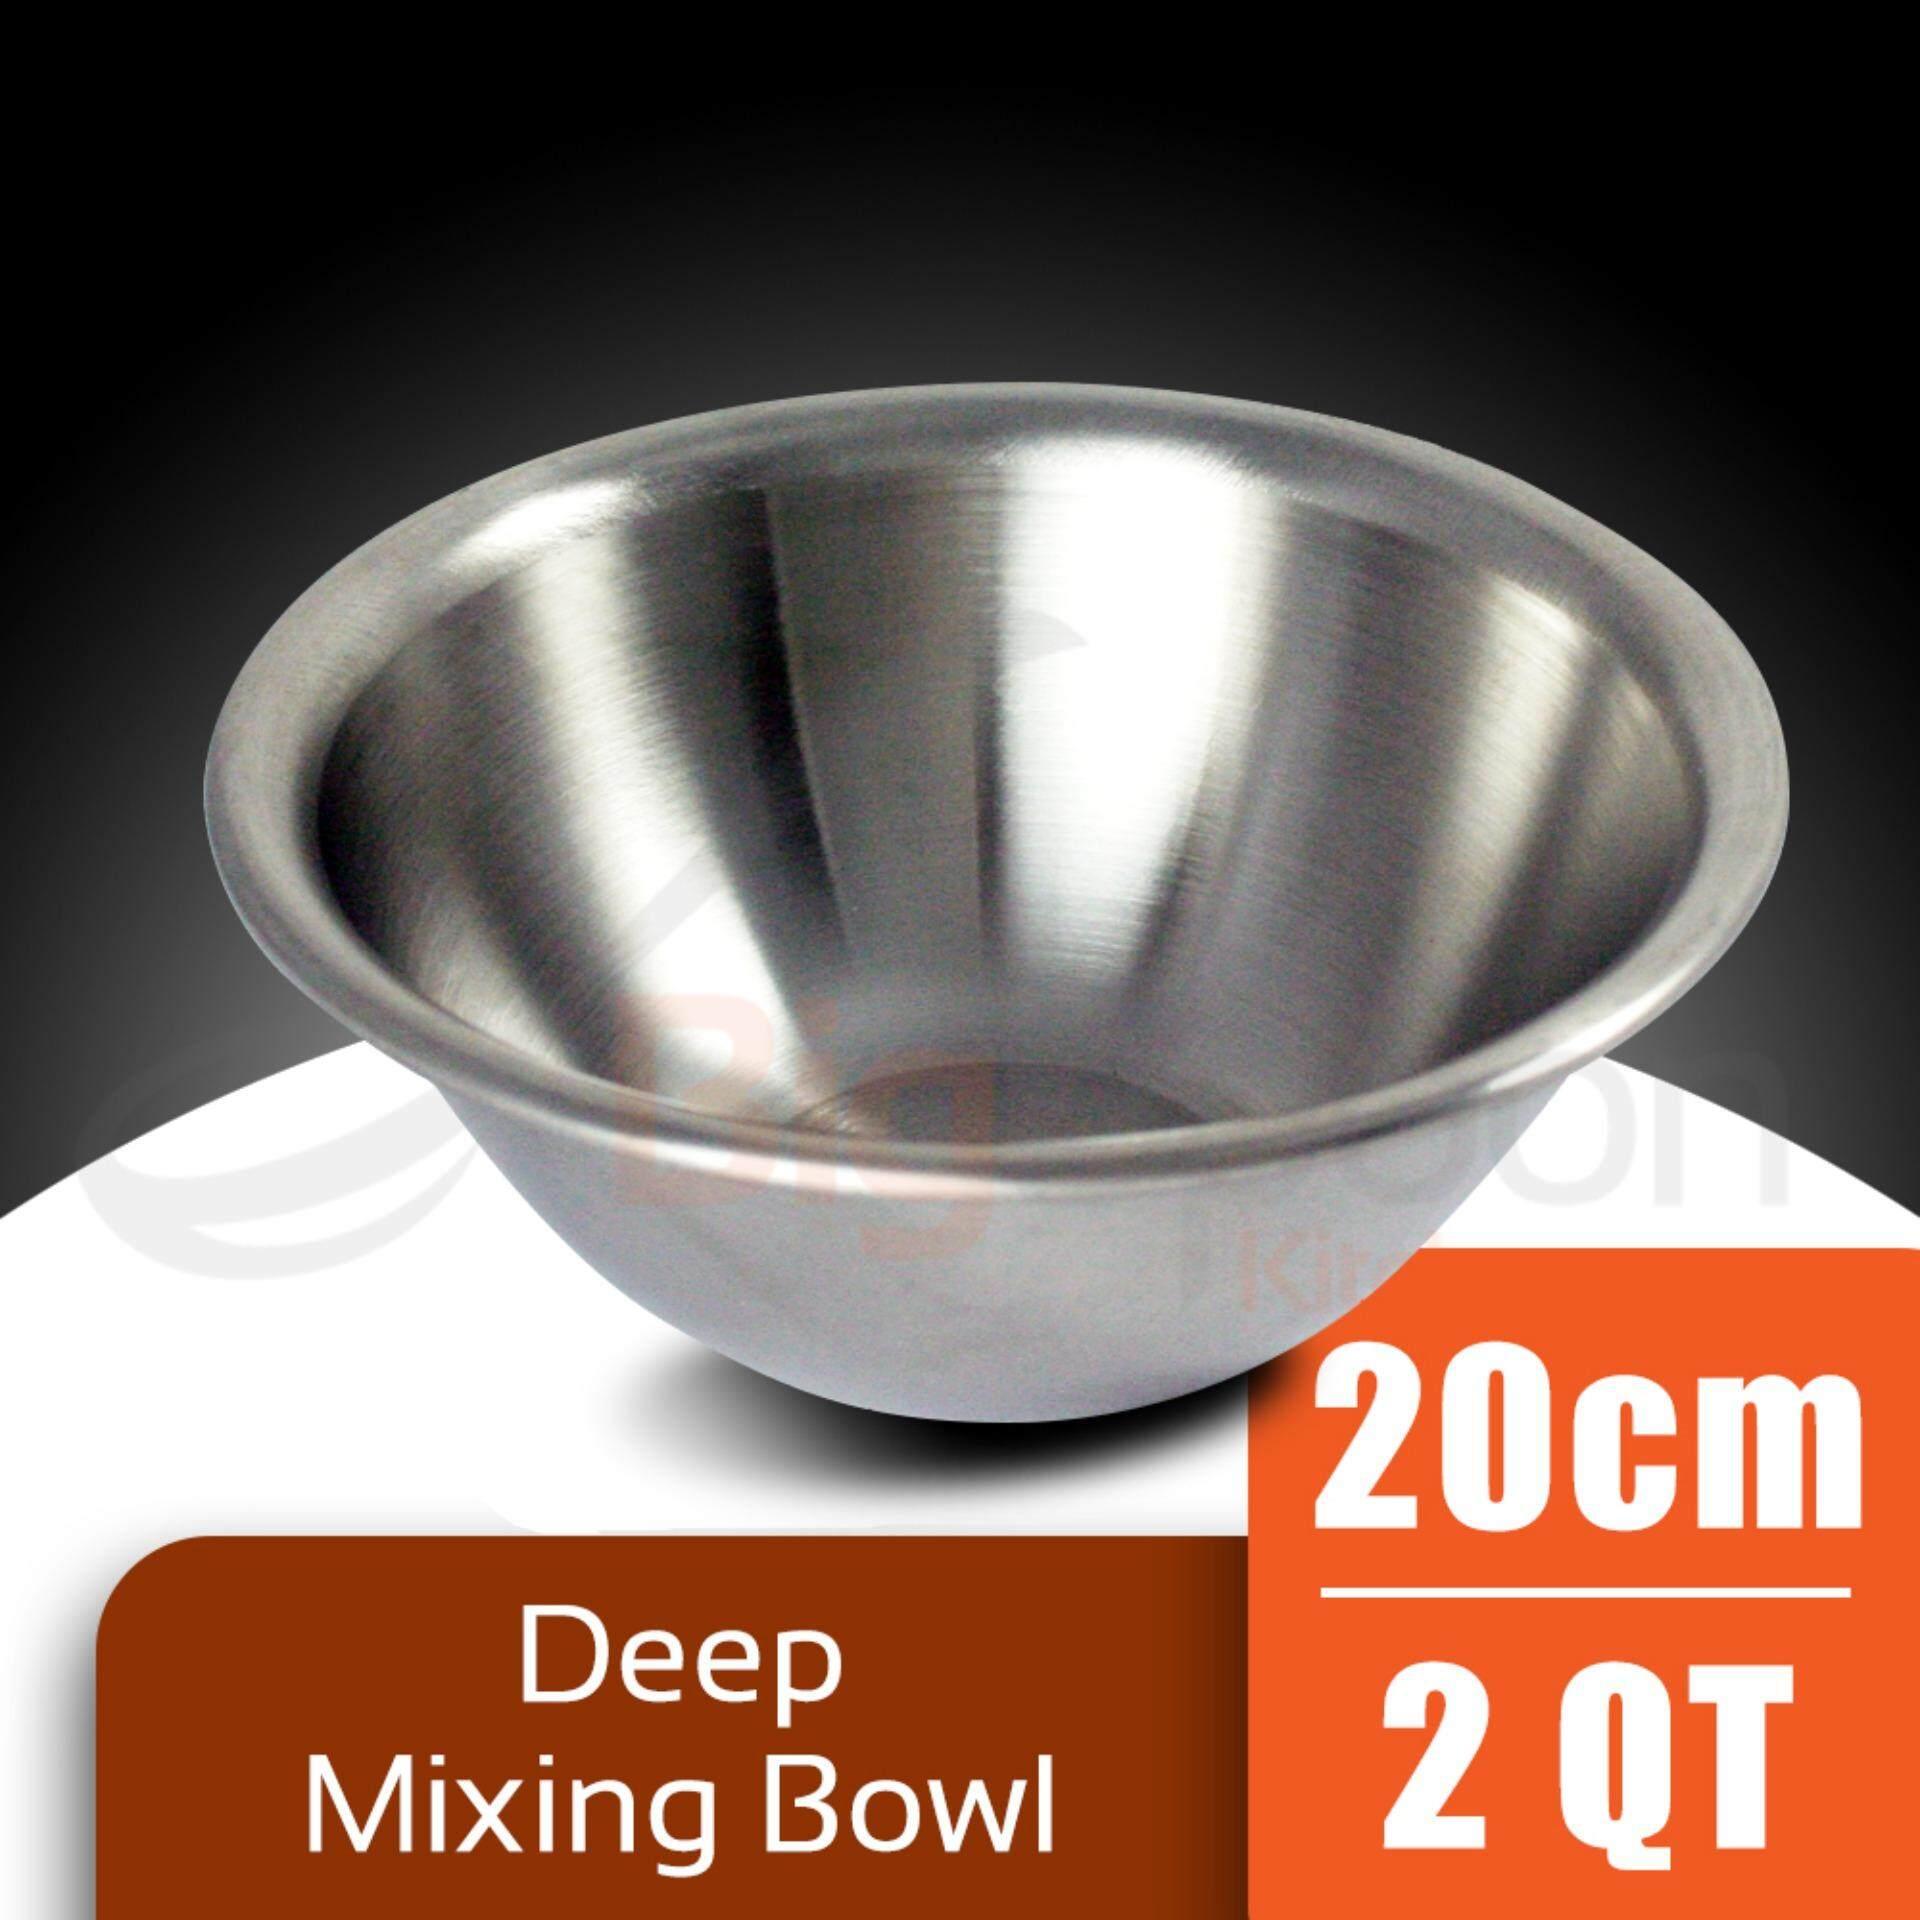 Deep Mixing Bowl S/Steel - 20cm